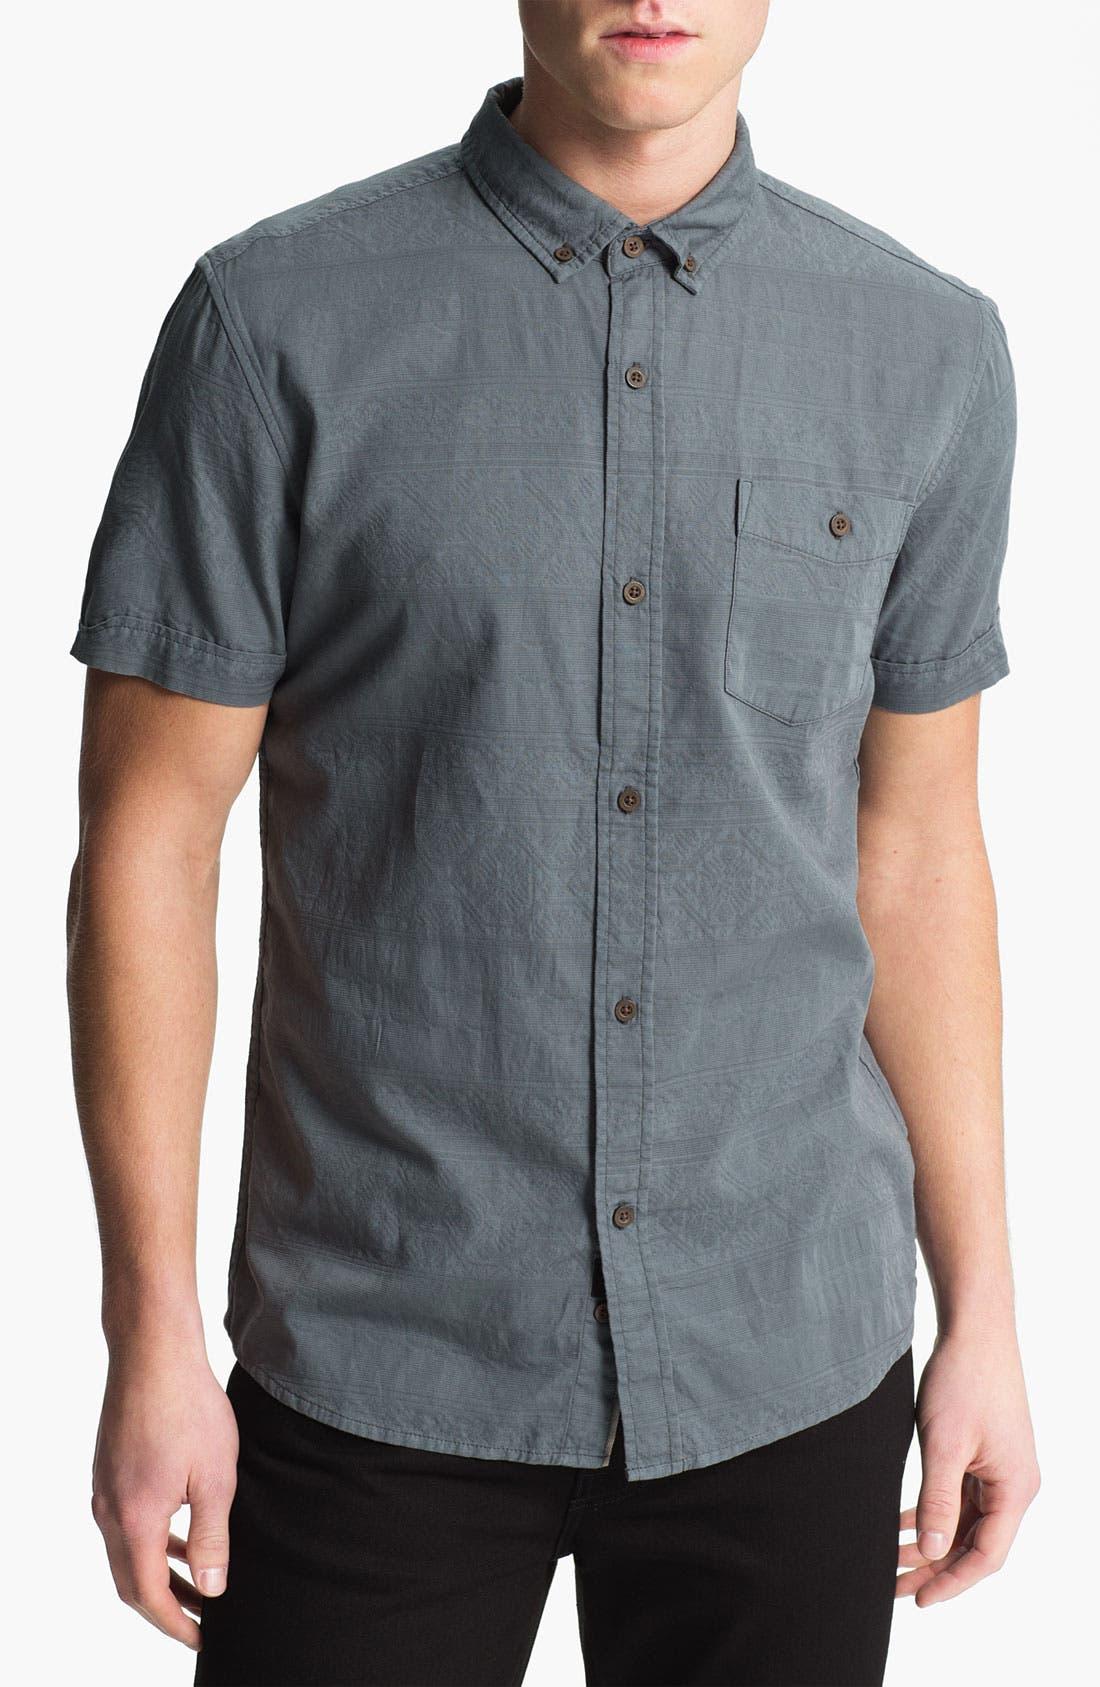 Alternate Image 1 Selected - Zanerobe 'Boho' Woven Shirt